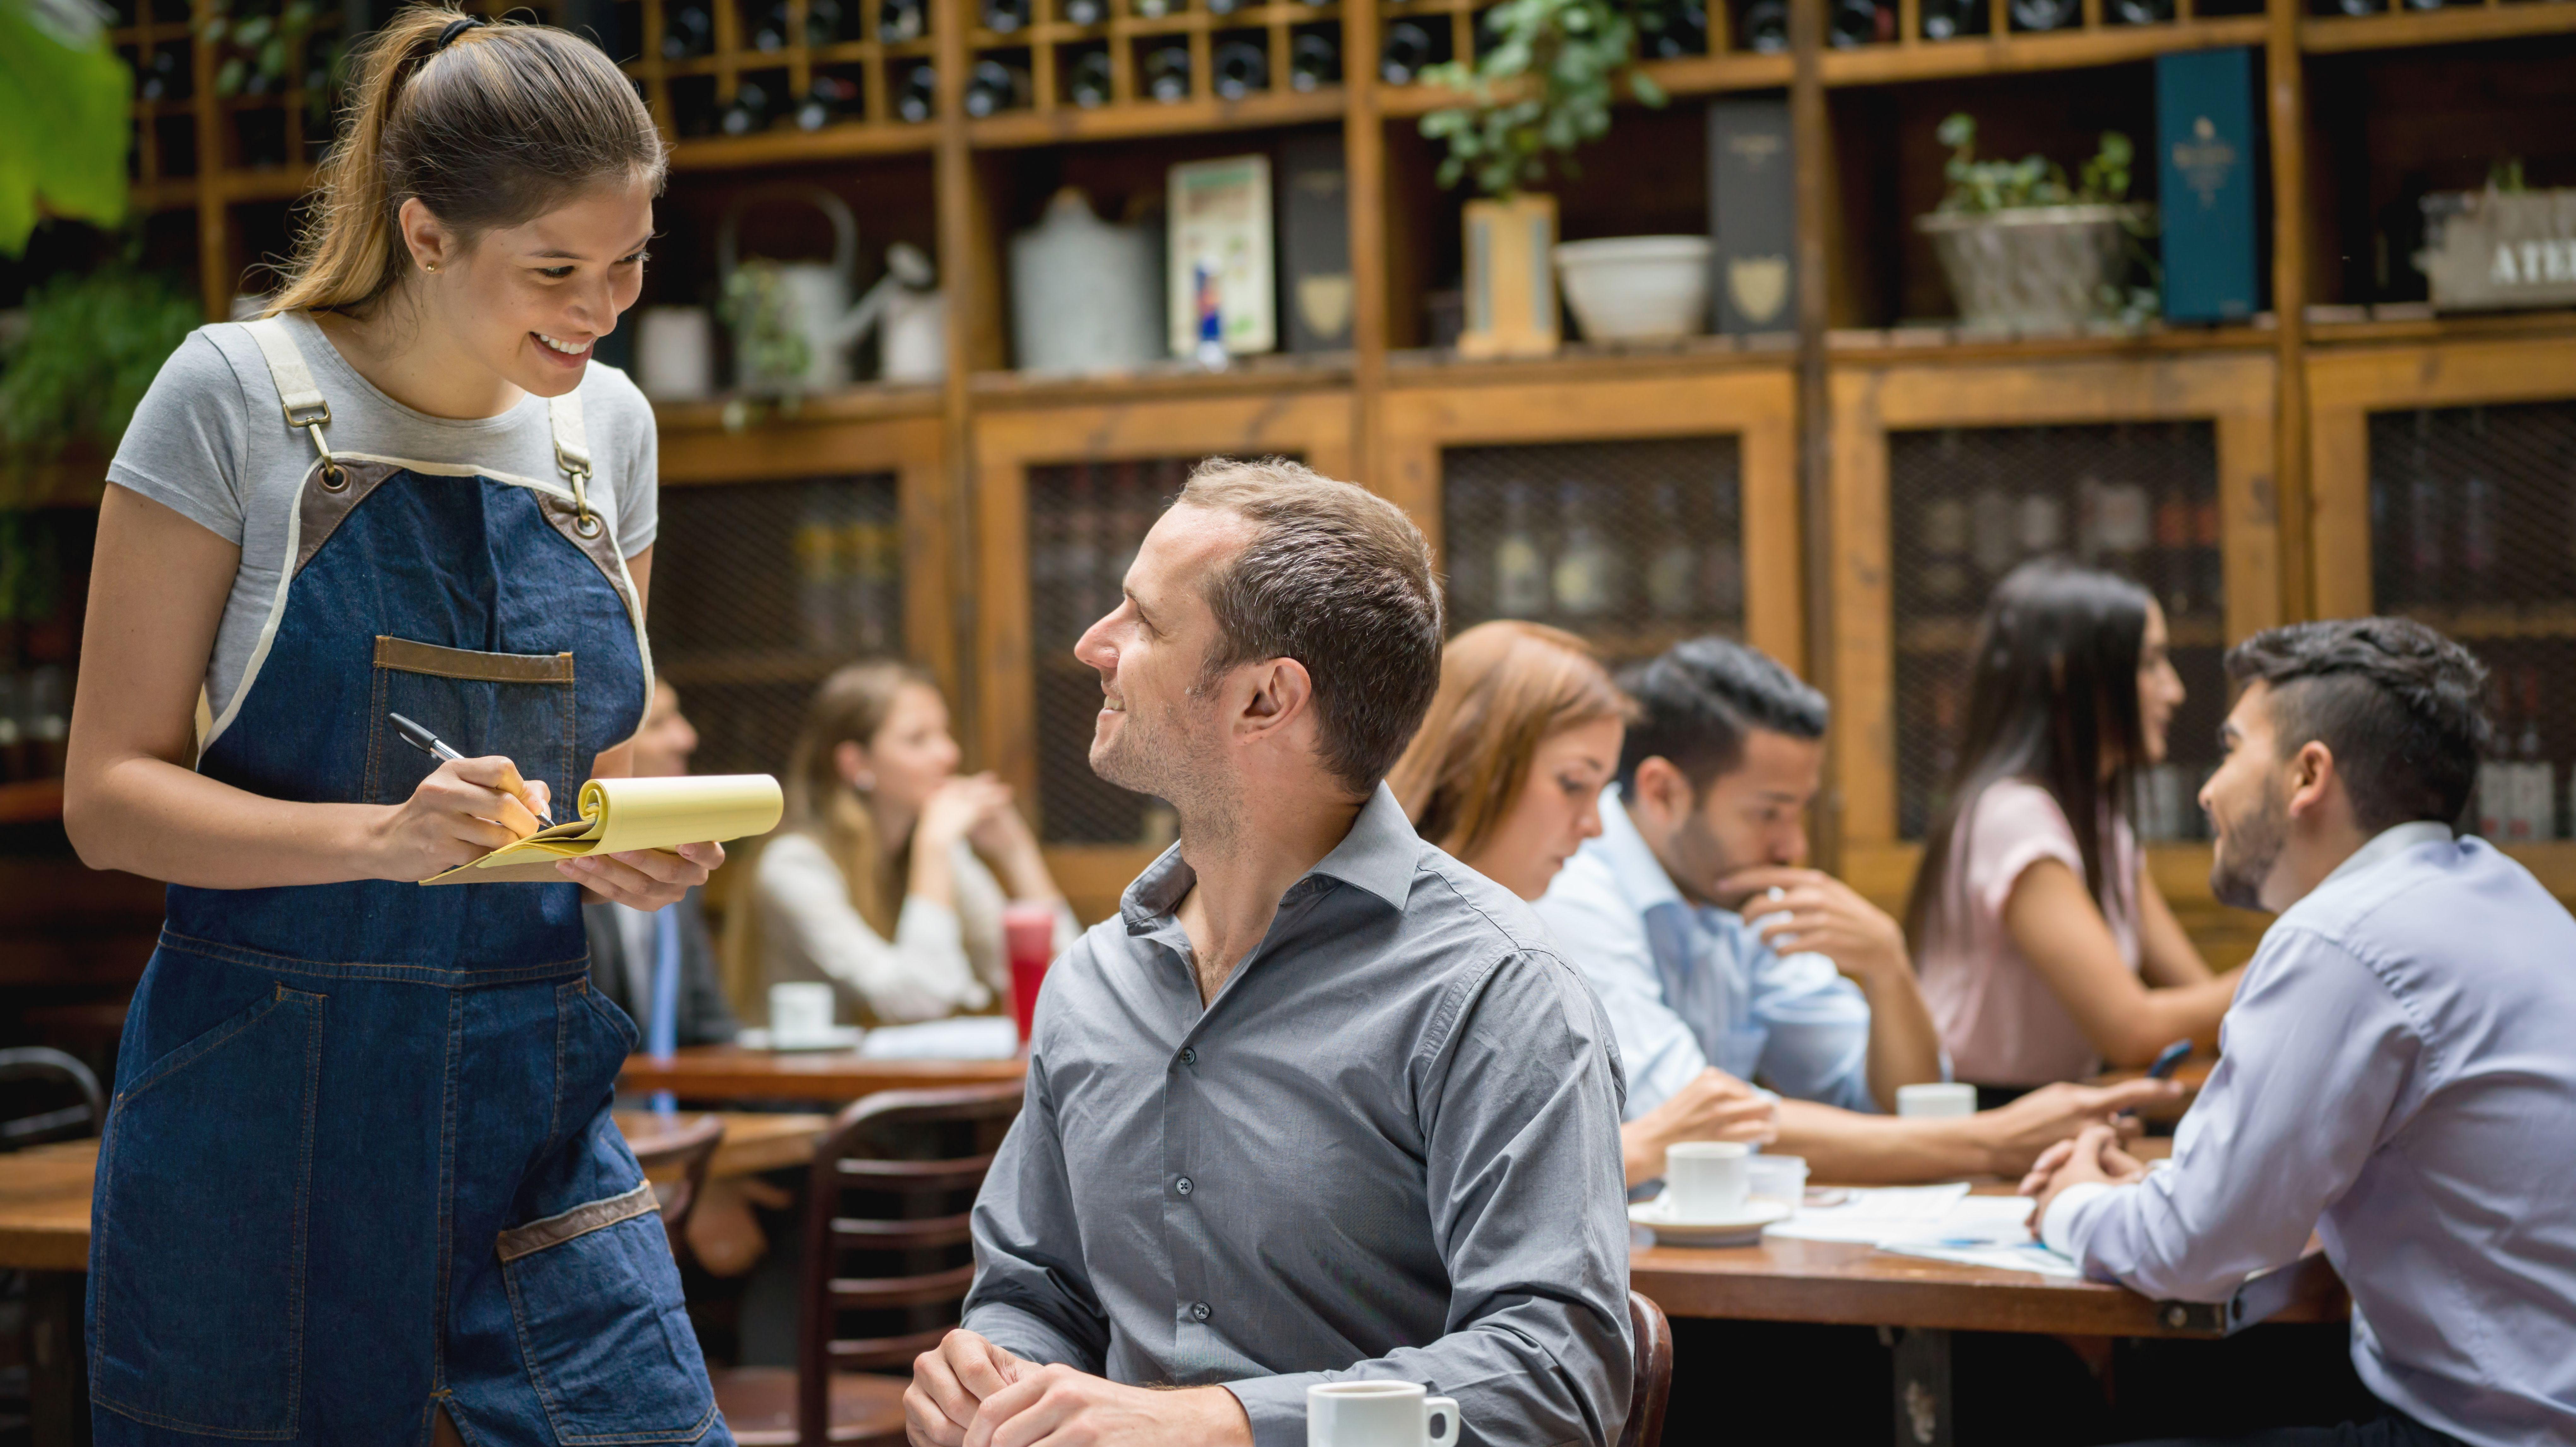 11 Secrets of Restaurant Servers   Mental Floss